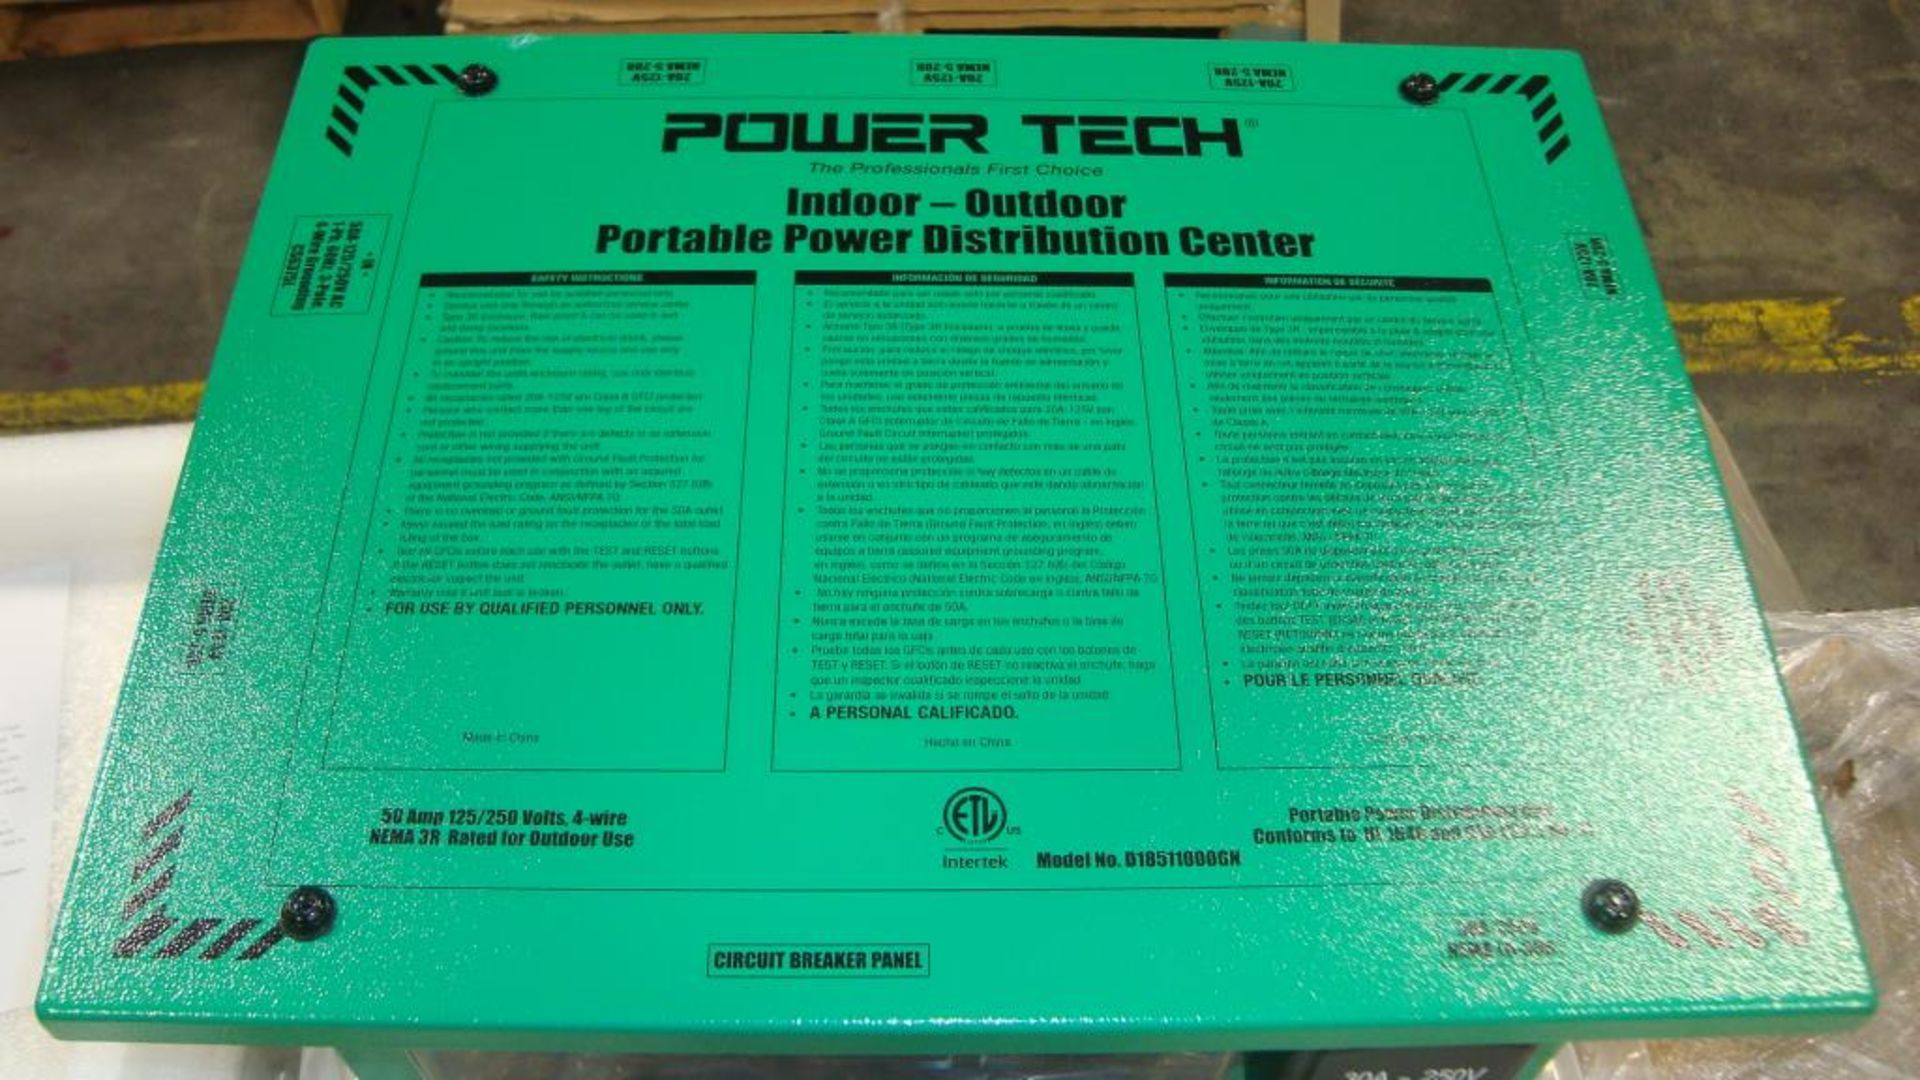 Power Distribution Center. Lot: (1 skid/24 per skid) Power Tech Model D18511000GN Indoor- Outdoor